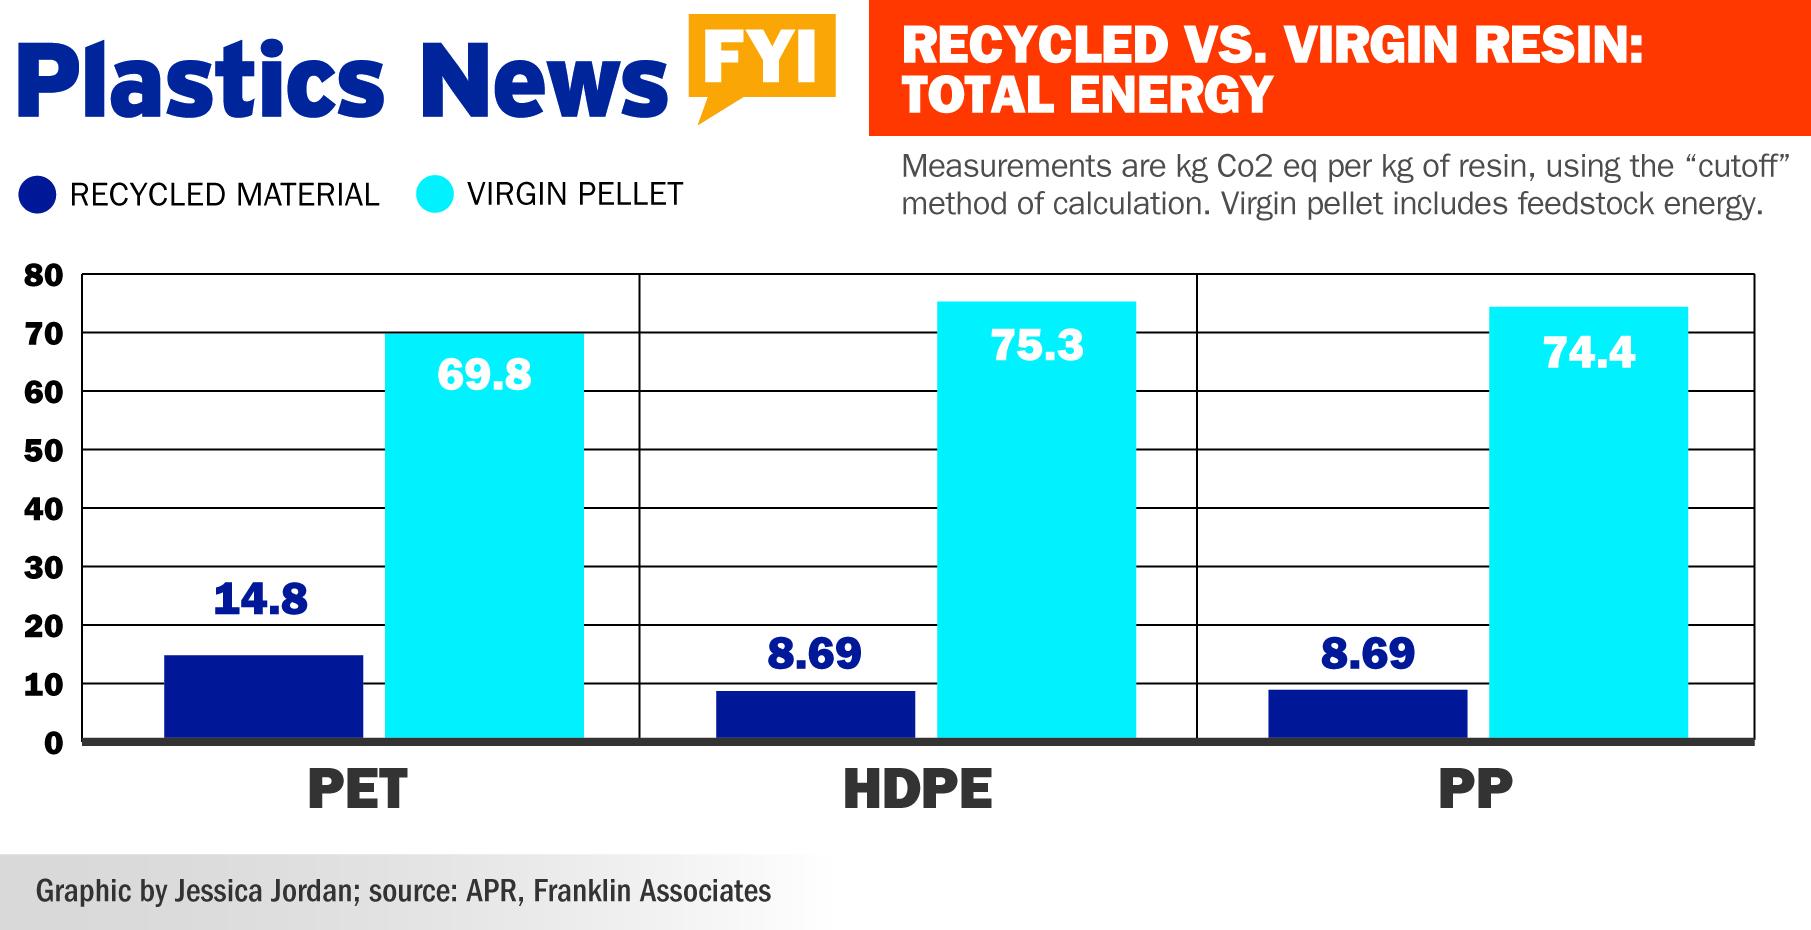 Virgin vs Recycled Plastic